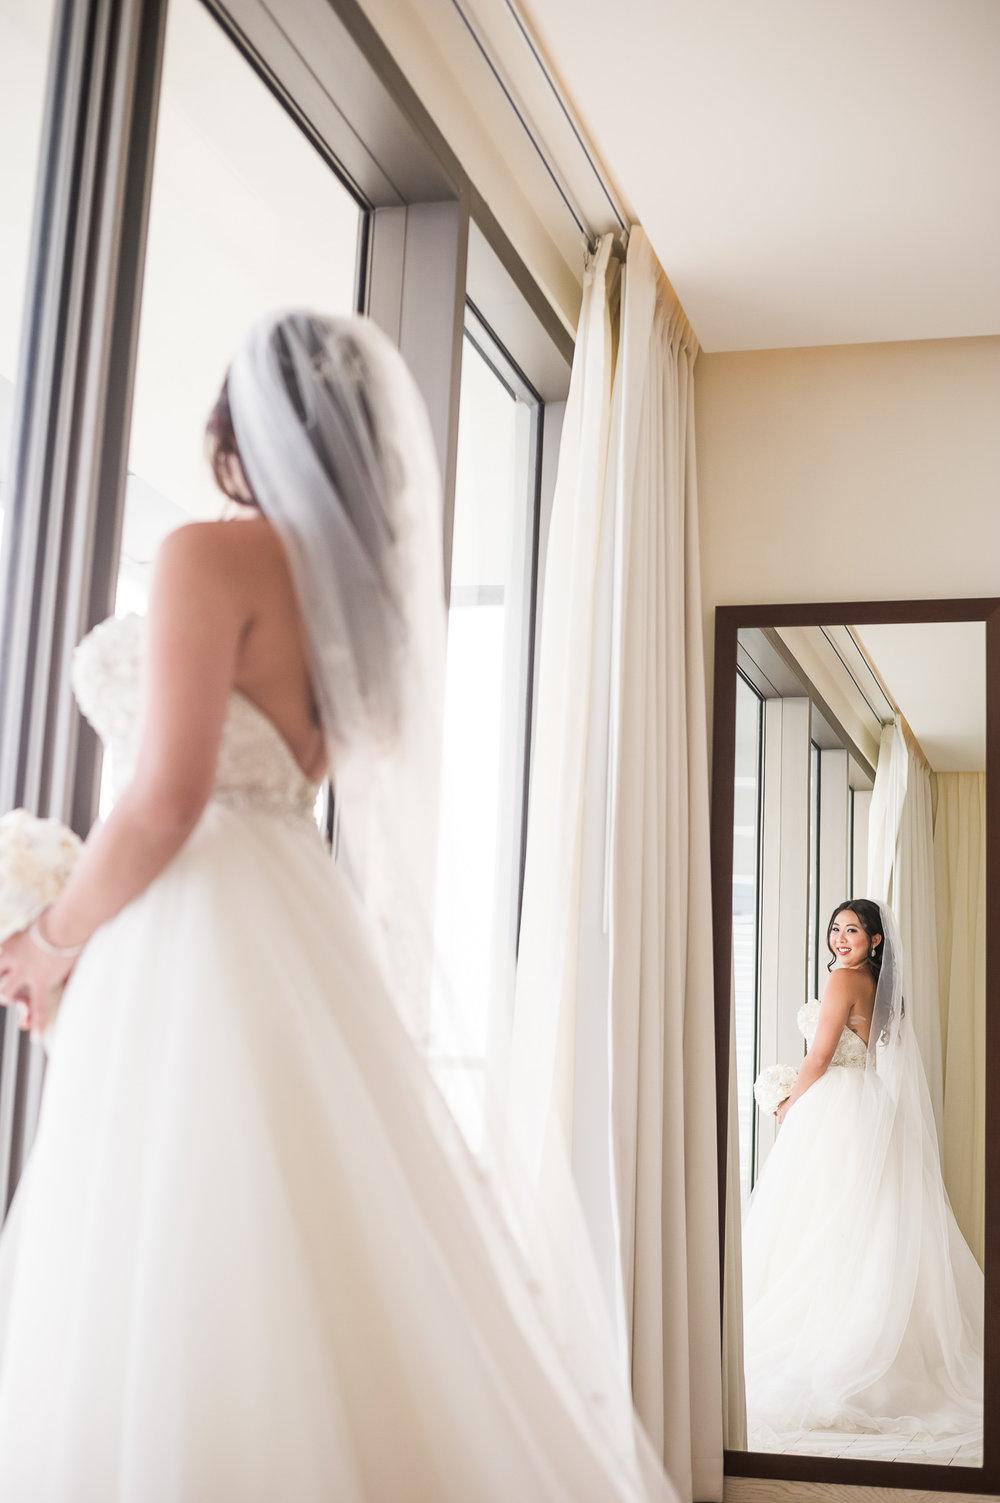 17-David Loi Studios - Cancun - Mexico - Destination Wedding-25605.jpg